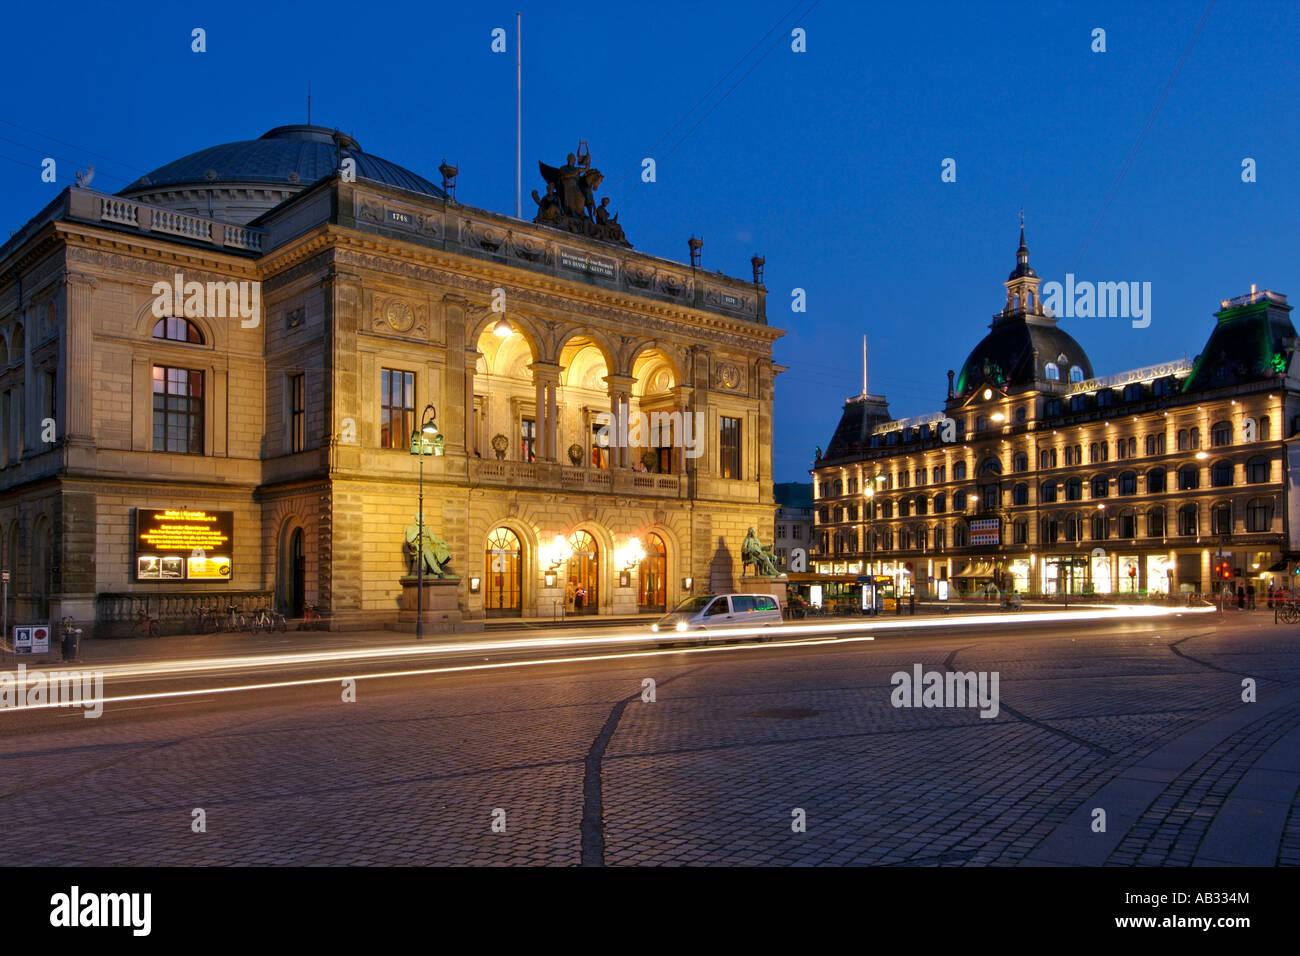 The Royal Theatre (Kongelige Teater) and the Magasin du Nord seen from Kongens Nytorv in Copenhagen Denmark. - Stock Image